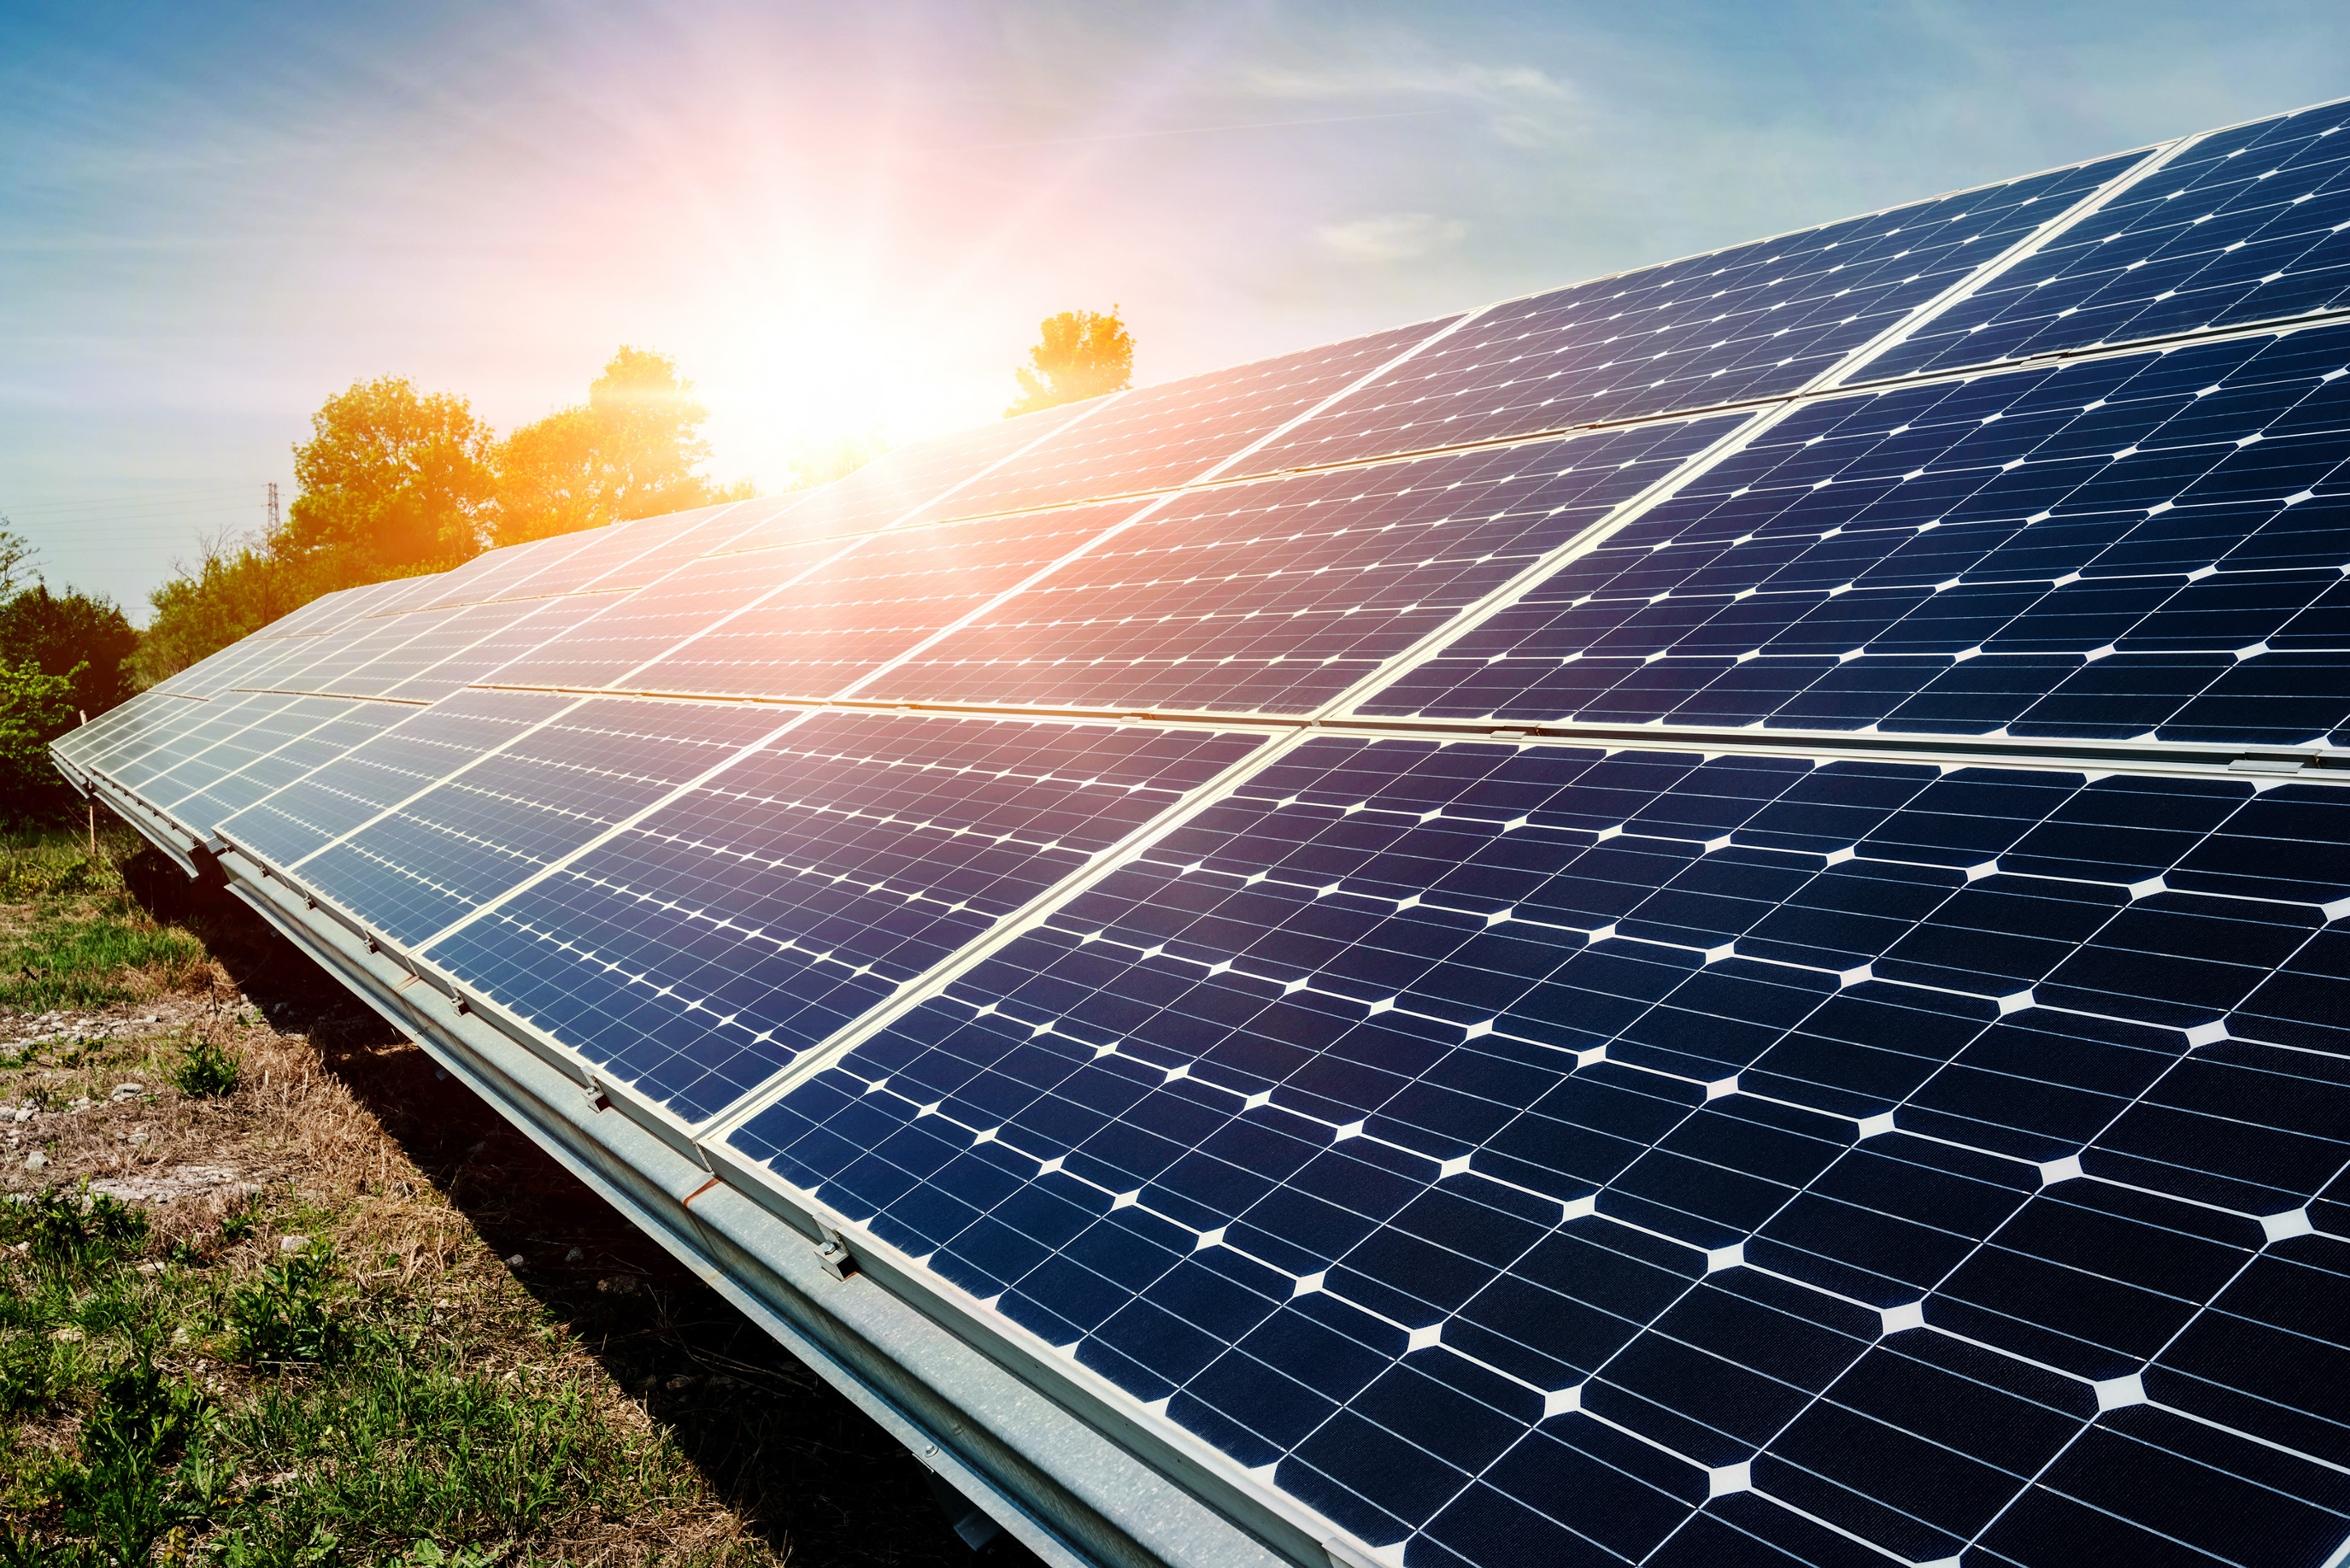 Solar Panels in Sunlight for Power Generation